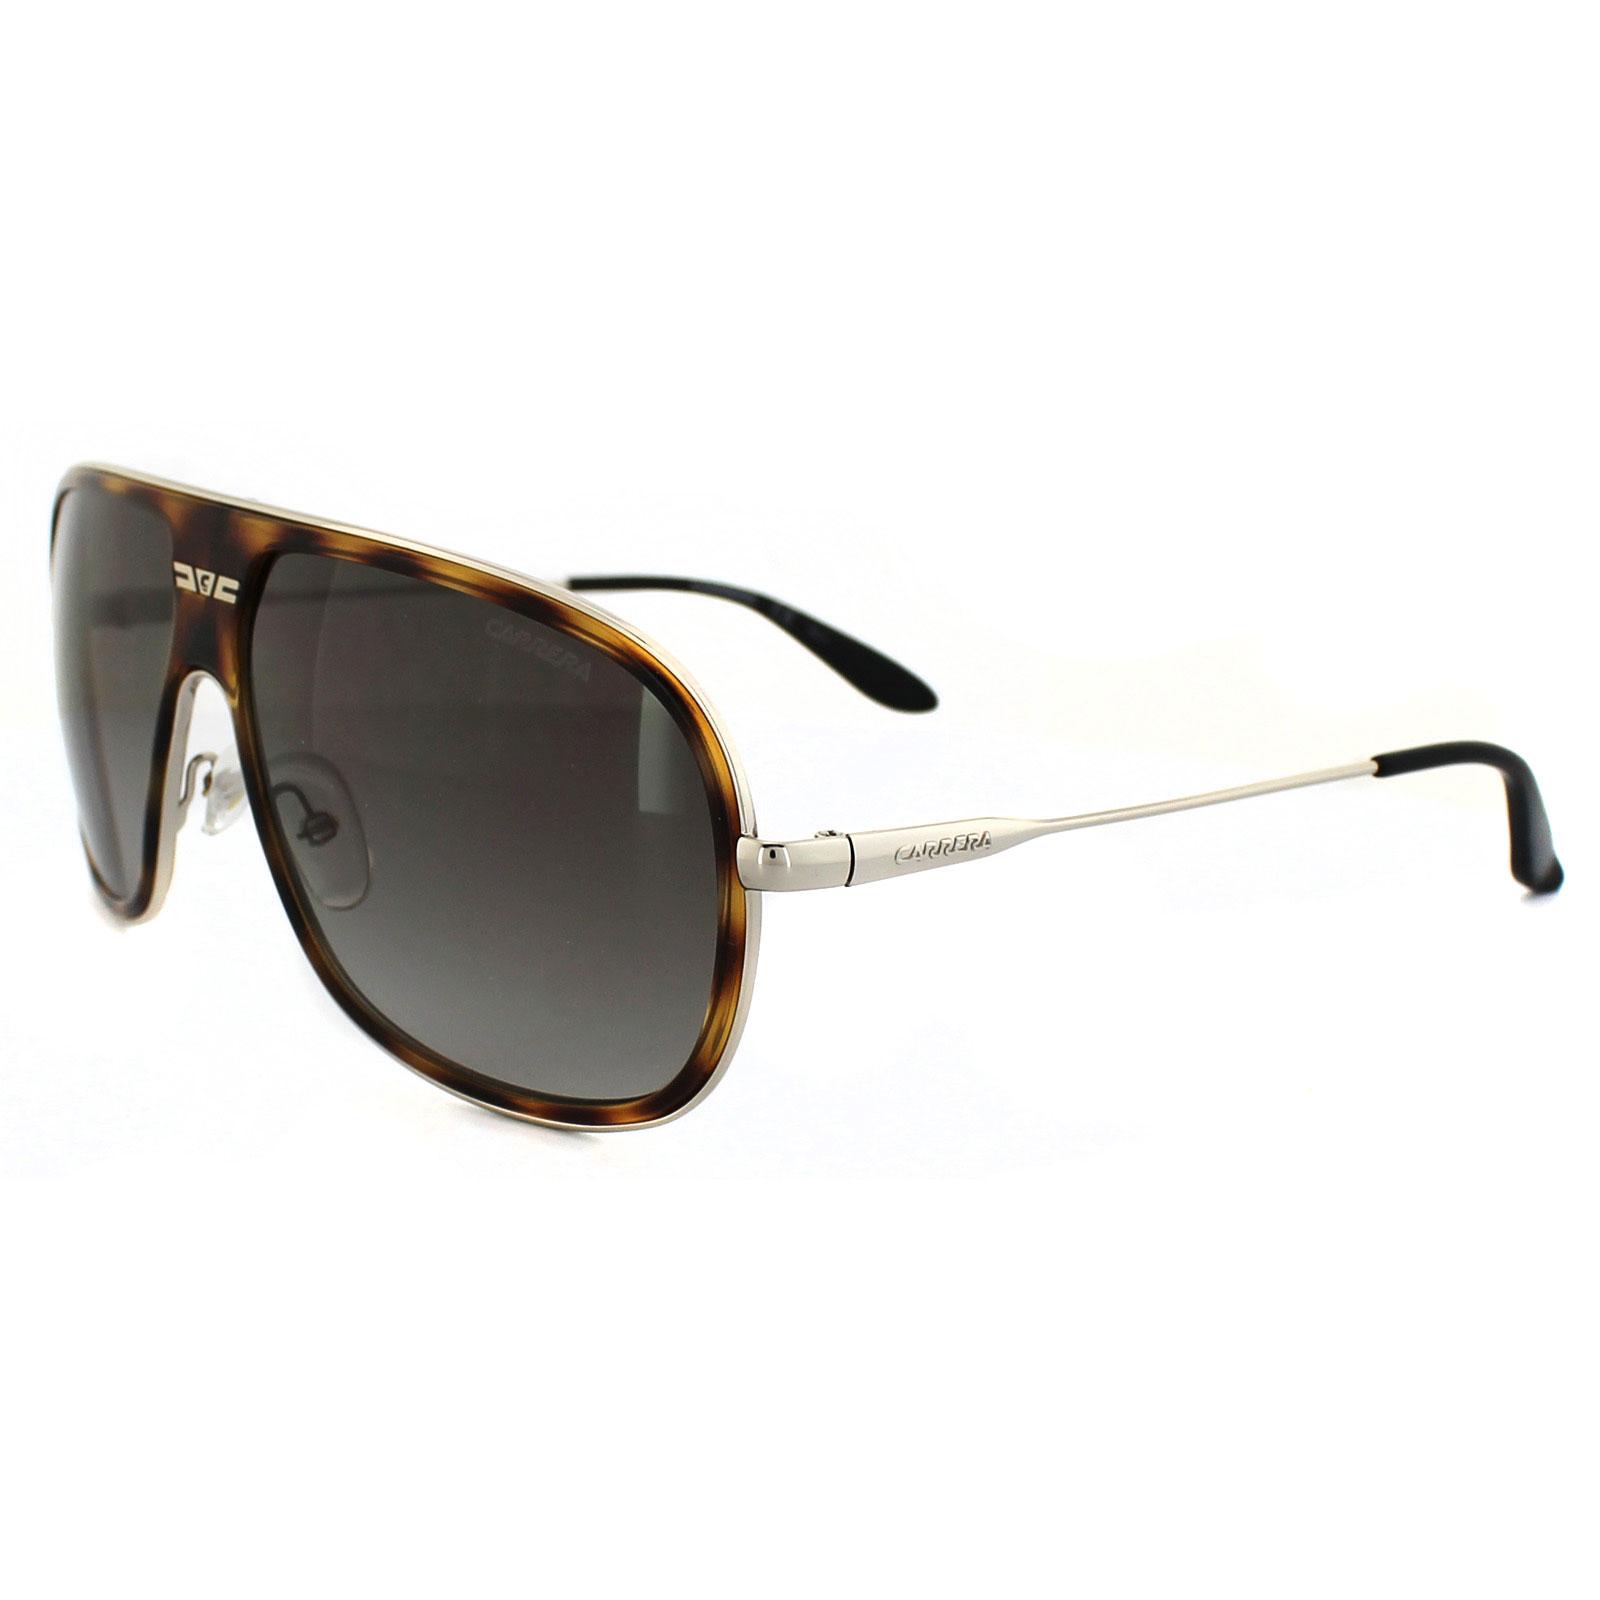 Sentinel Carrera Sunglasses Carrera 88 8EN HA Light Havana Light Gold Brown  Gradient 236710648f